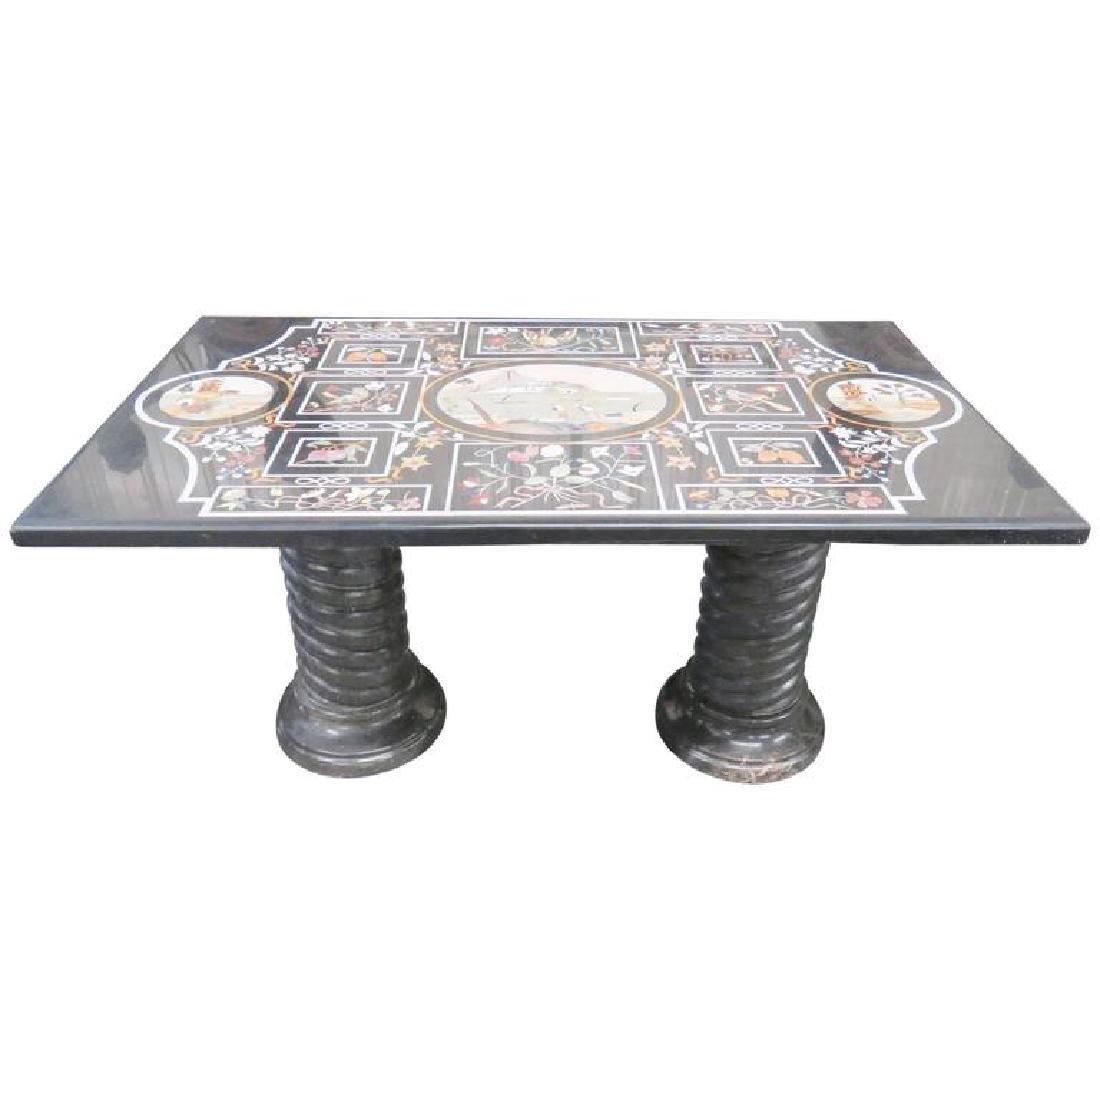 Italian Pietra Dura Inlaid Marble Dining Table